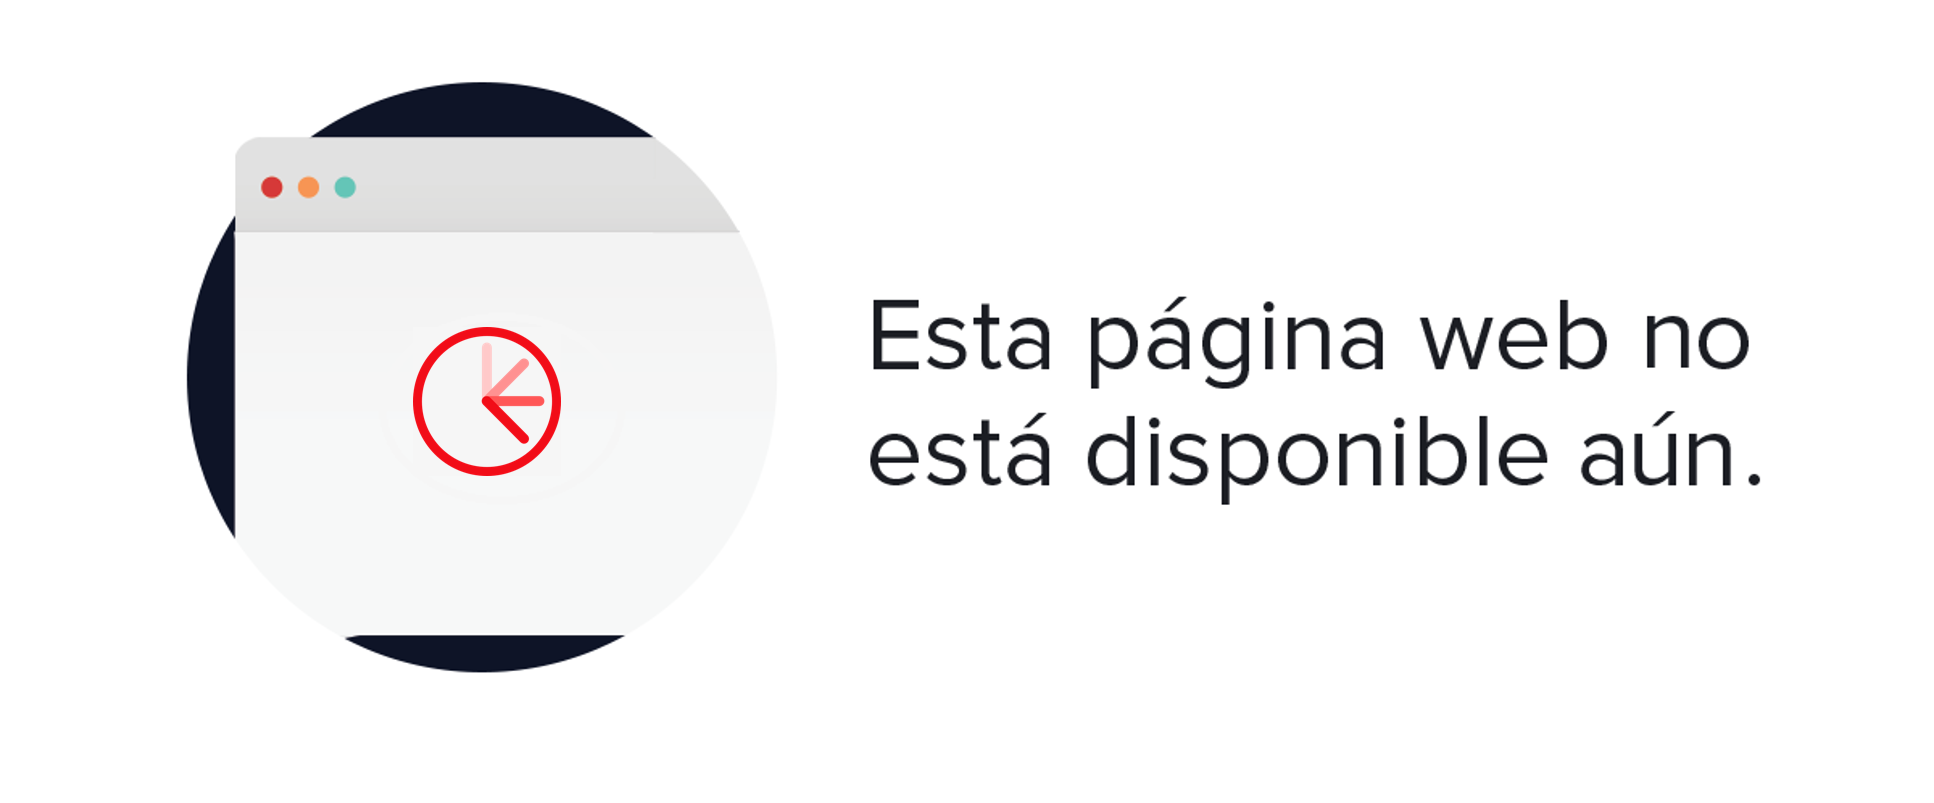 OXXO - Chaqueta de mujer OXXO fluida con bolsillos Negro 8681613249684 - GDWRXJY